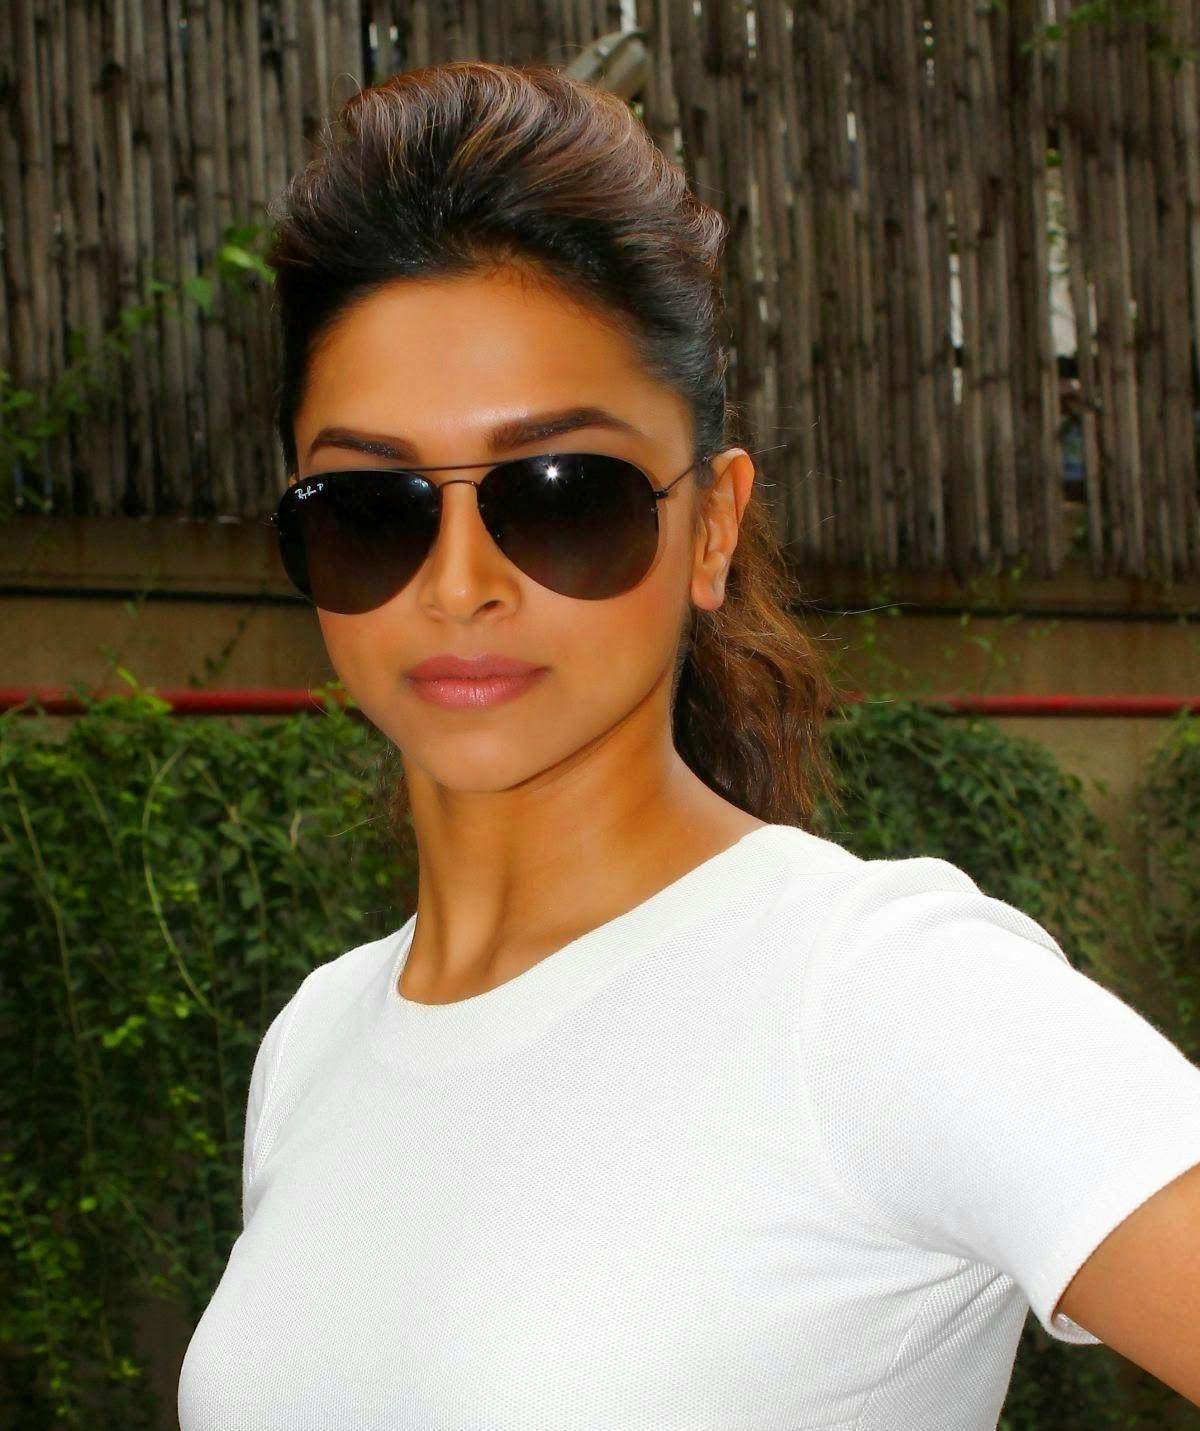 Deepika Padukone with Hot Sunglasses HD Photos and